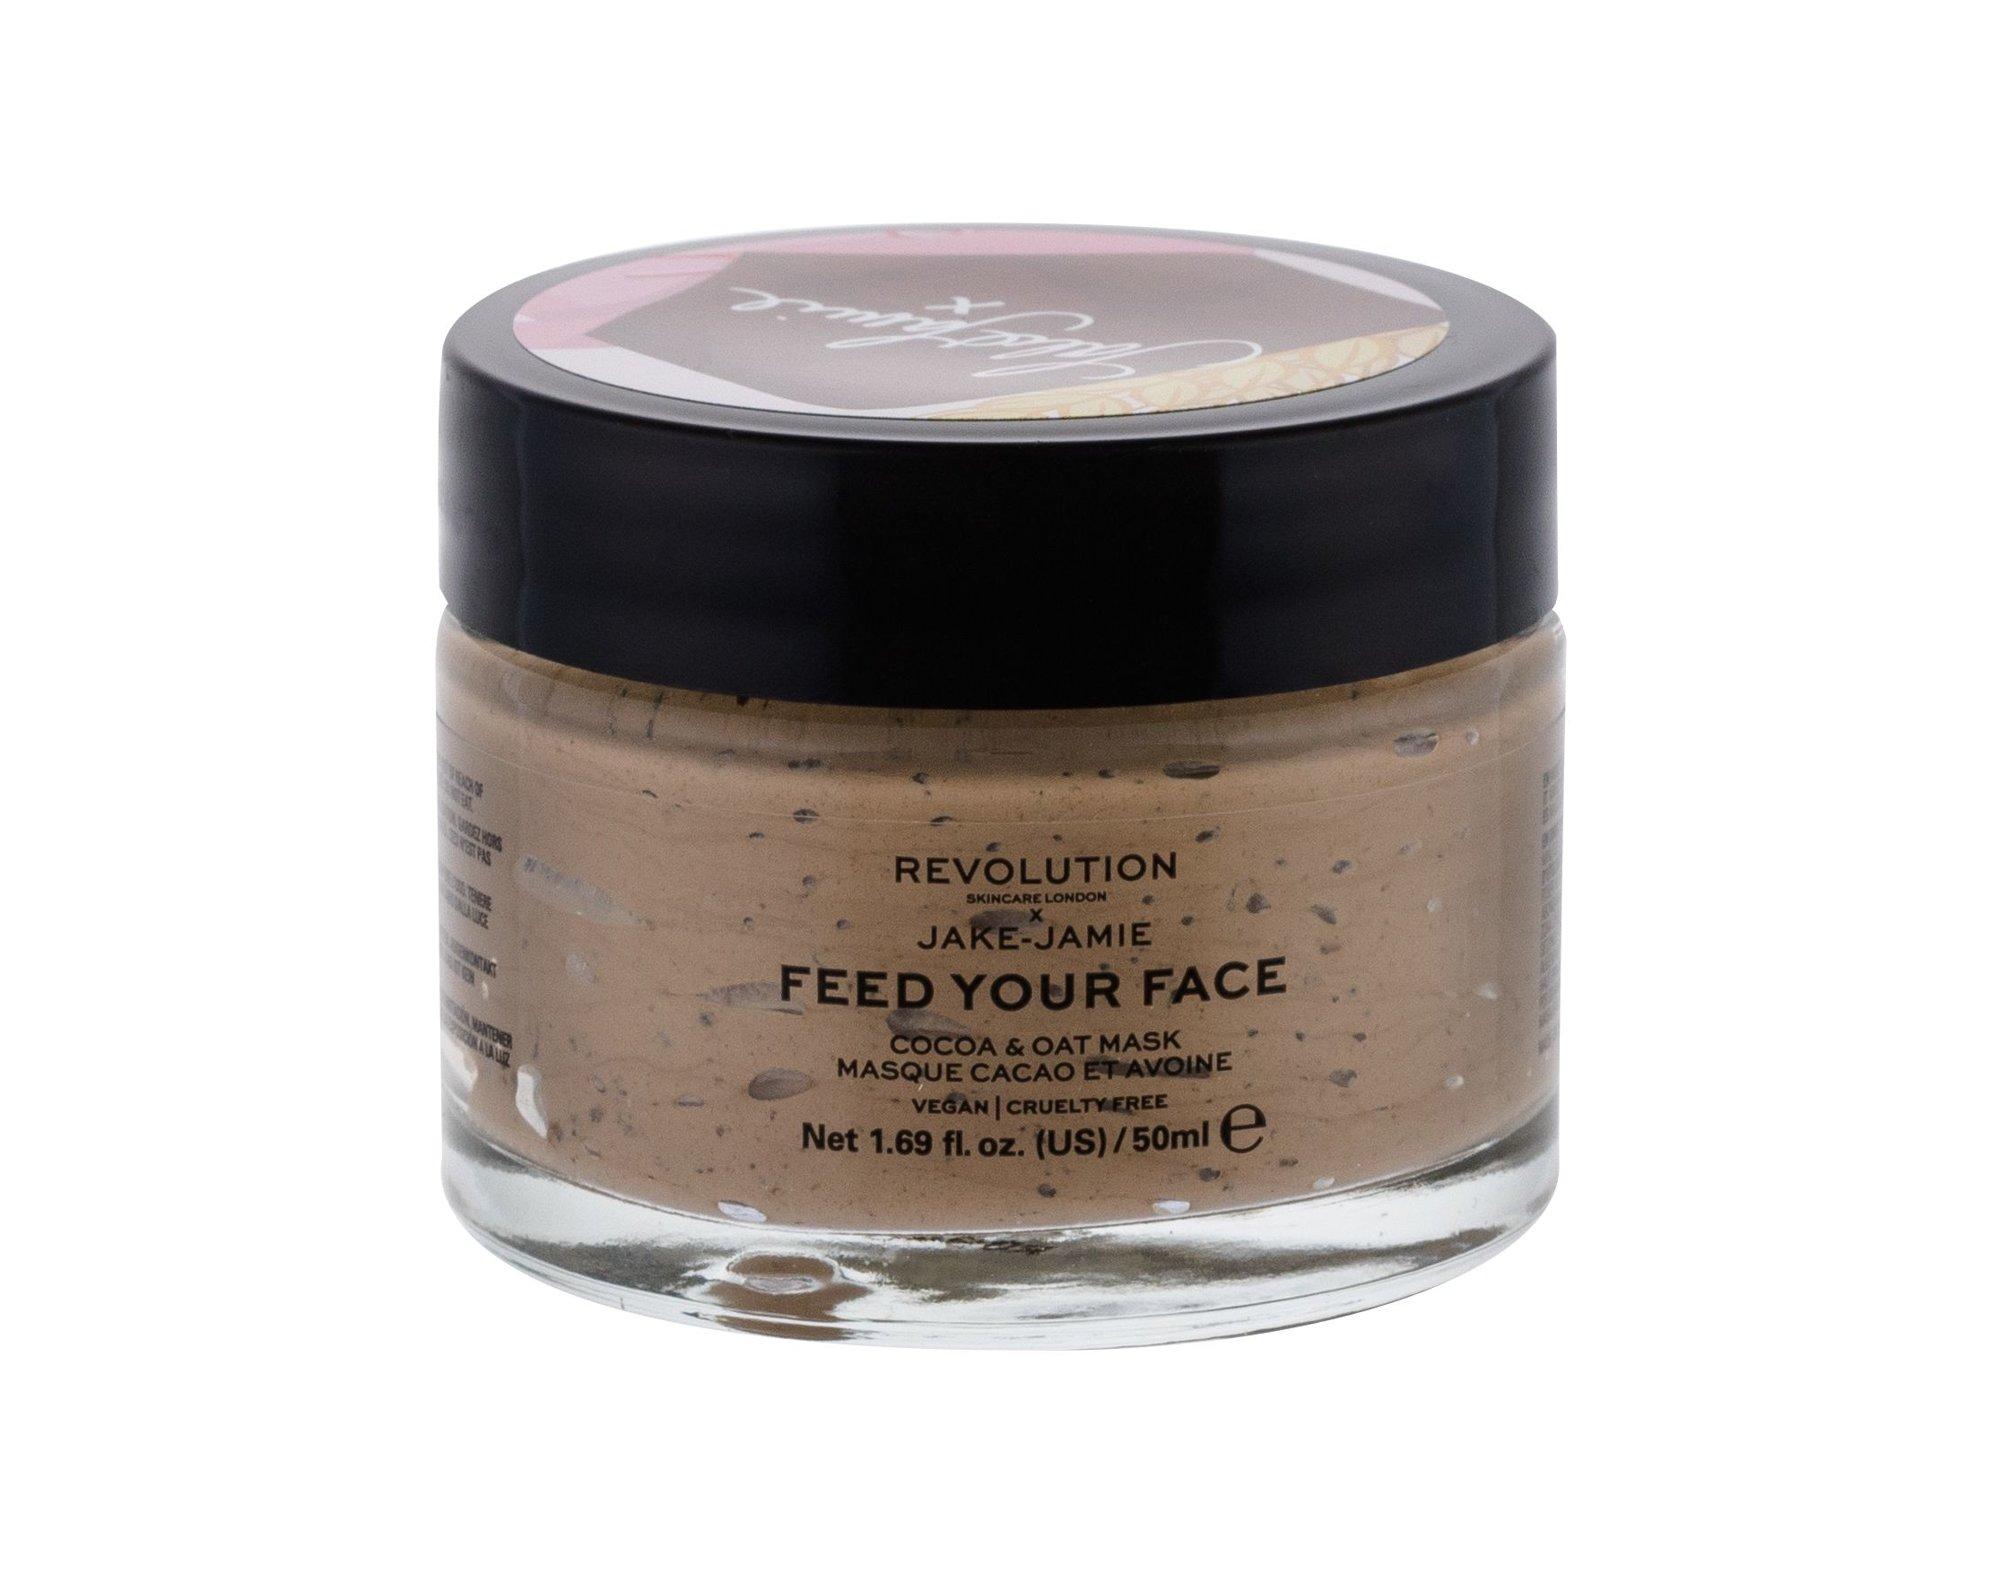 Makeup Revolution London Skincare X Jake-Jamie Face Mask 50ml Coco & Oat